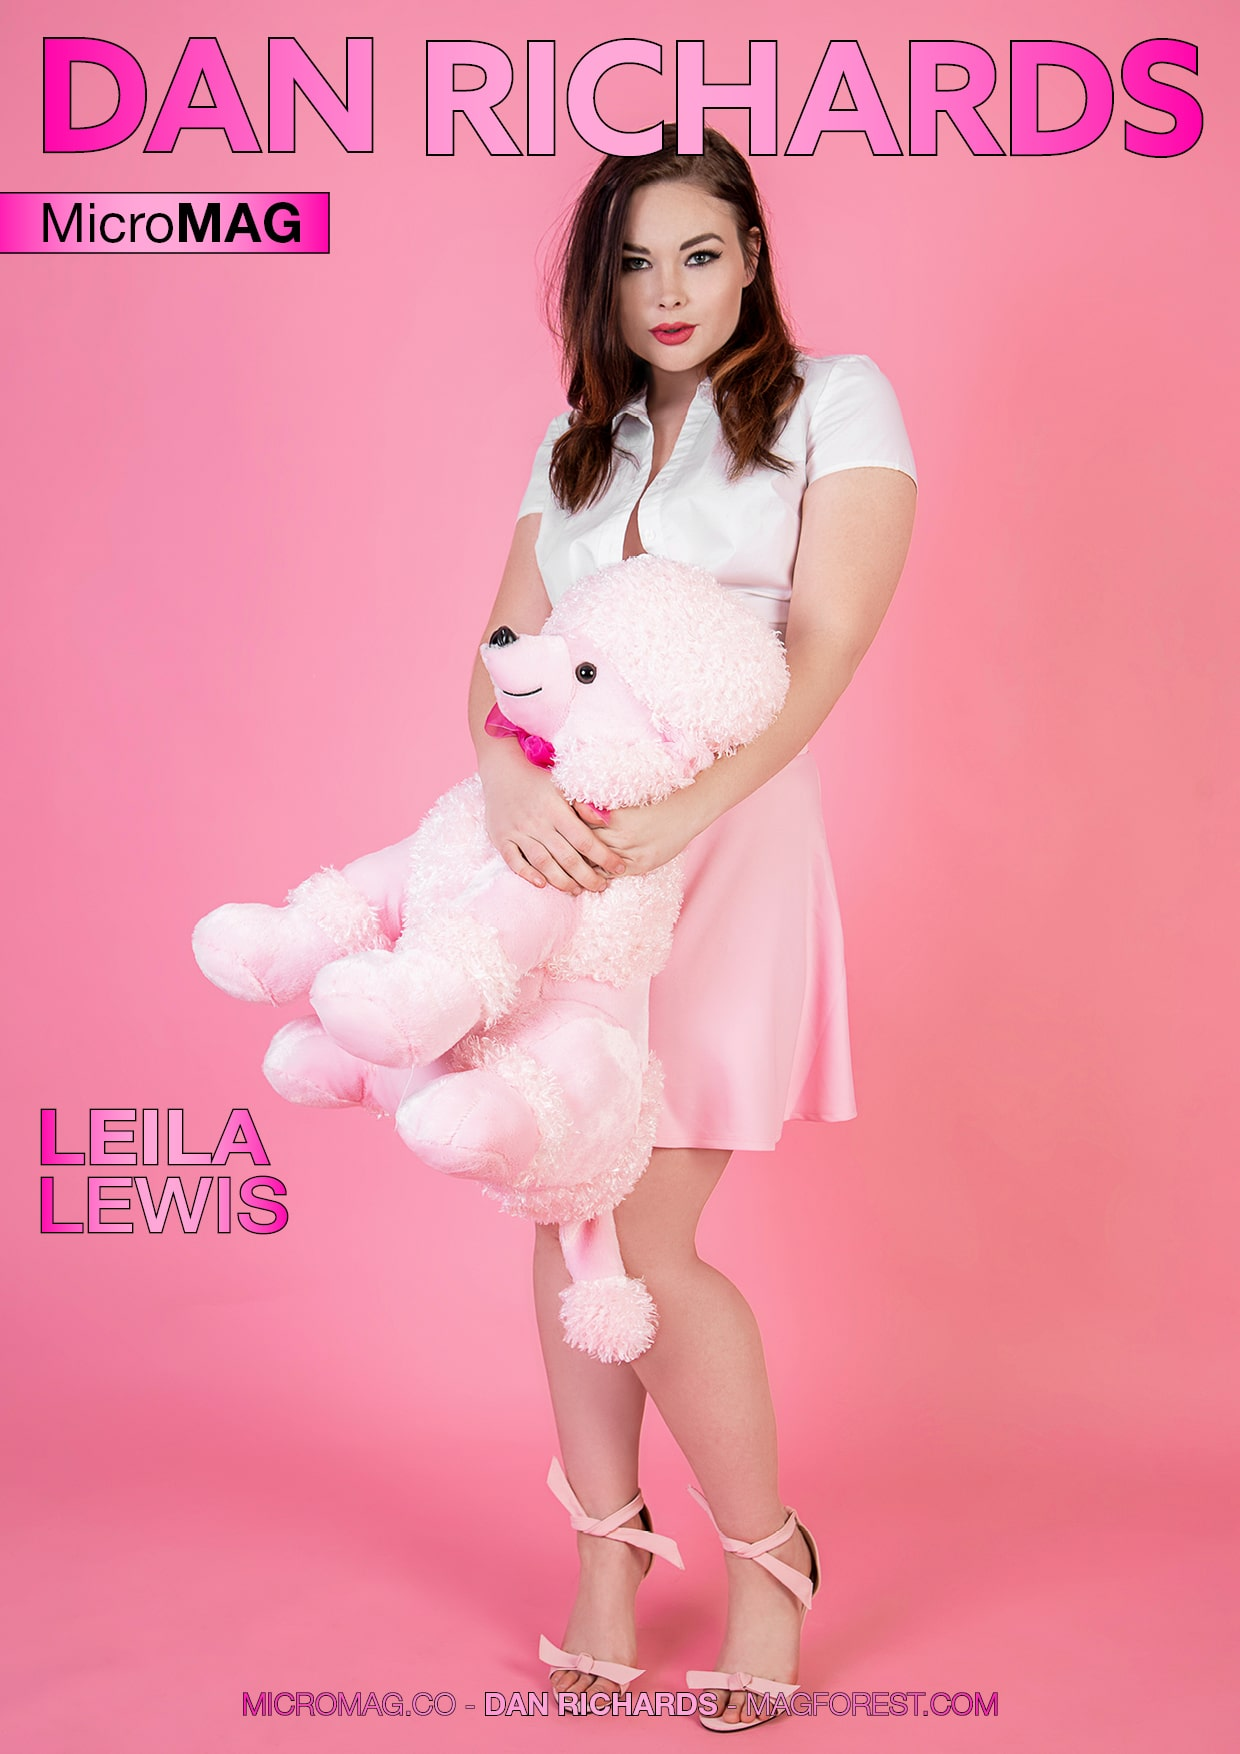 Dan Richards MicroMAG - Leila Lewis - Issue 8 1